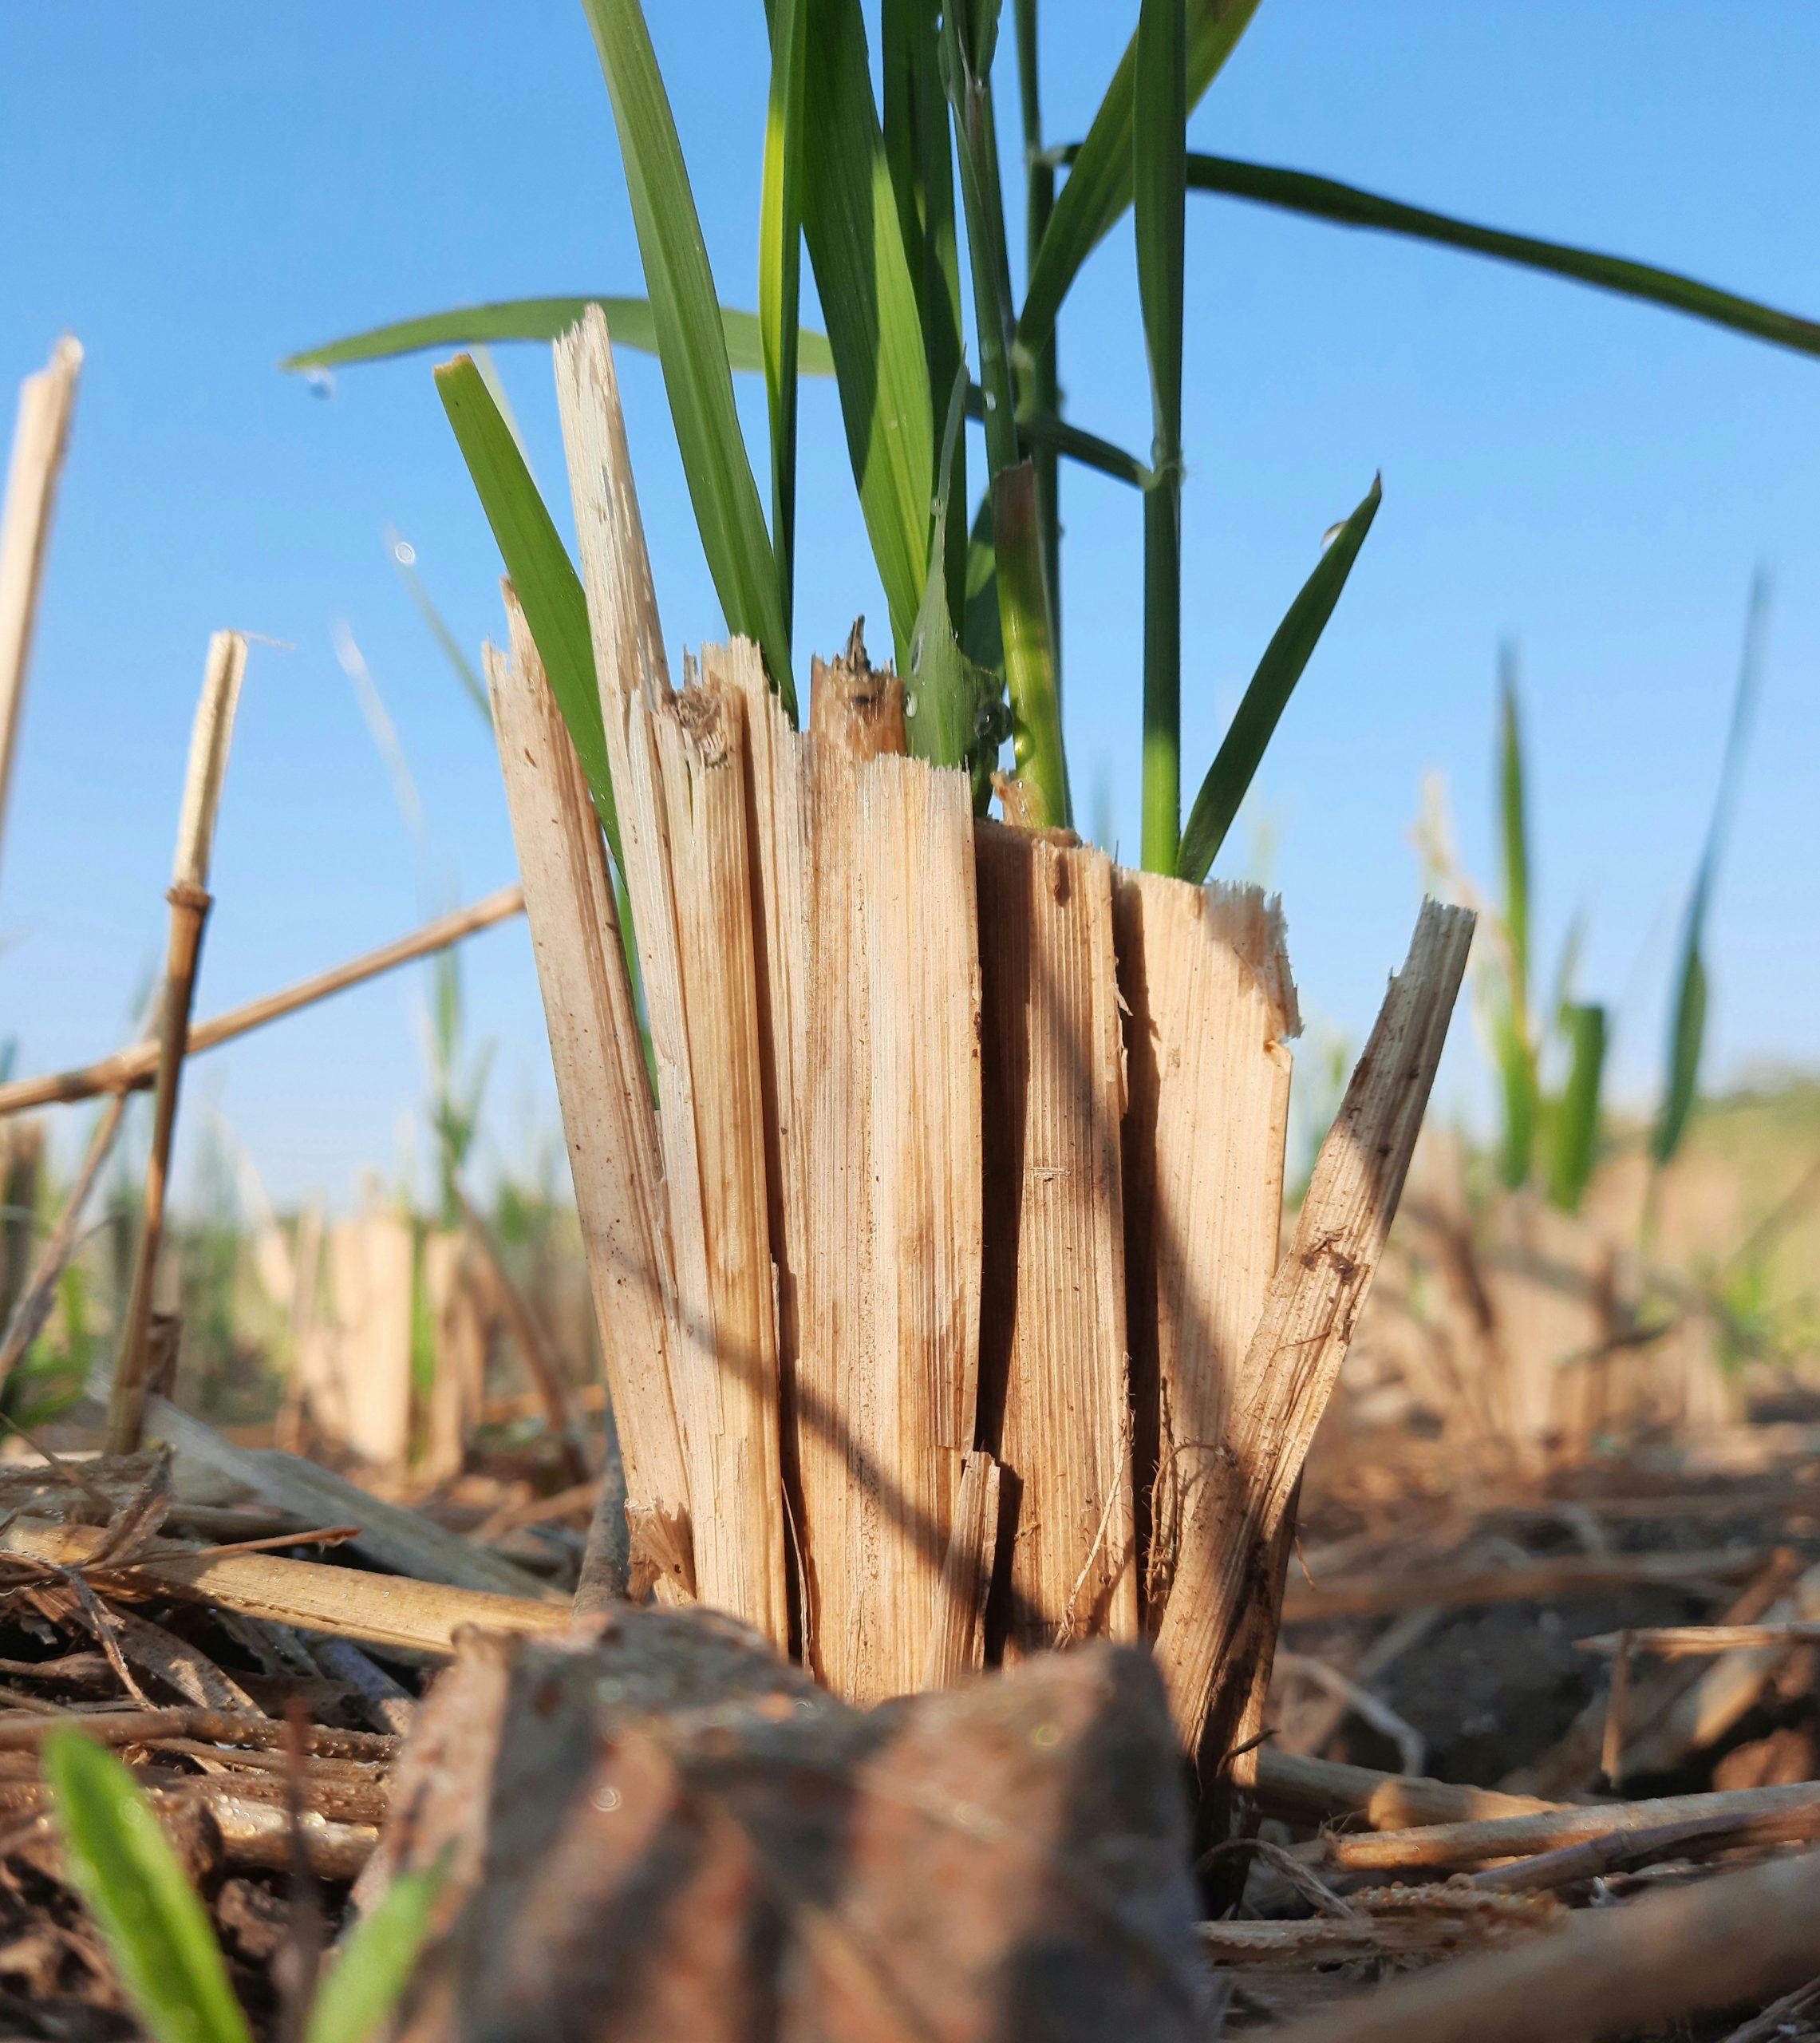 A rice plant stump